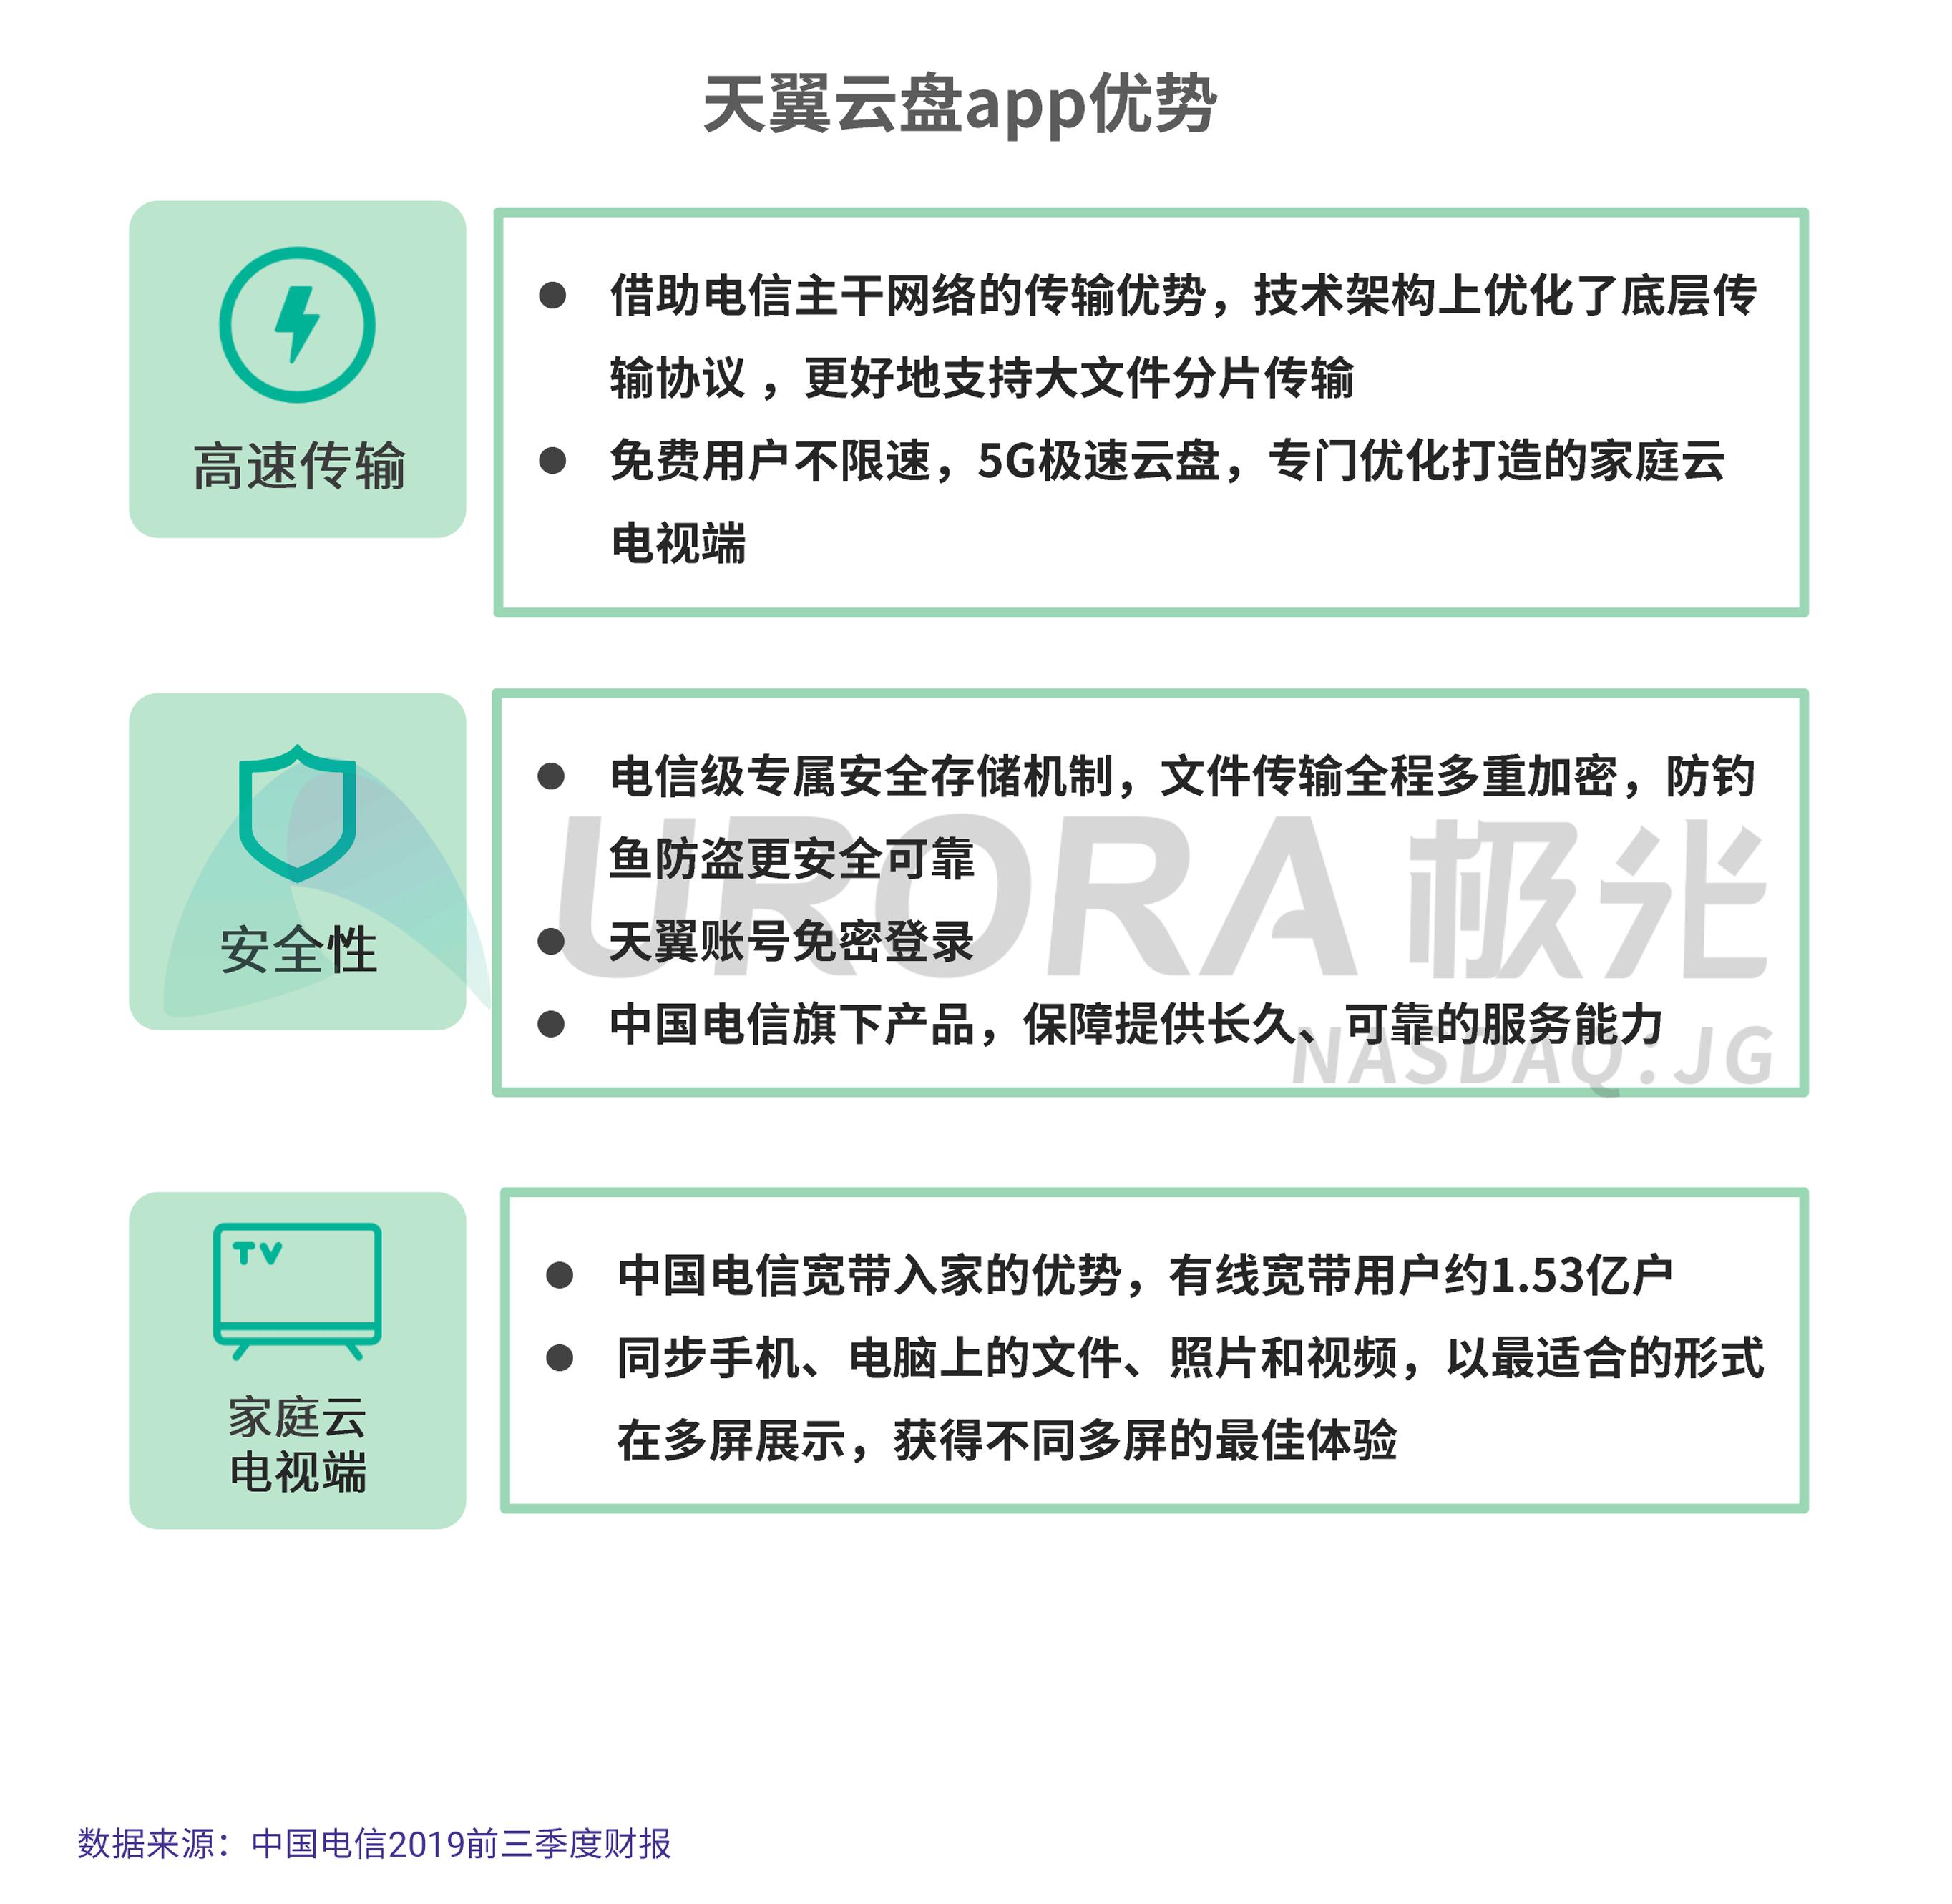 JIGUANG-个人网盘行业研究报告-final---切图版2-28.png